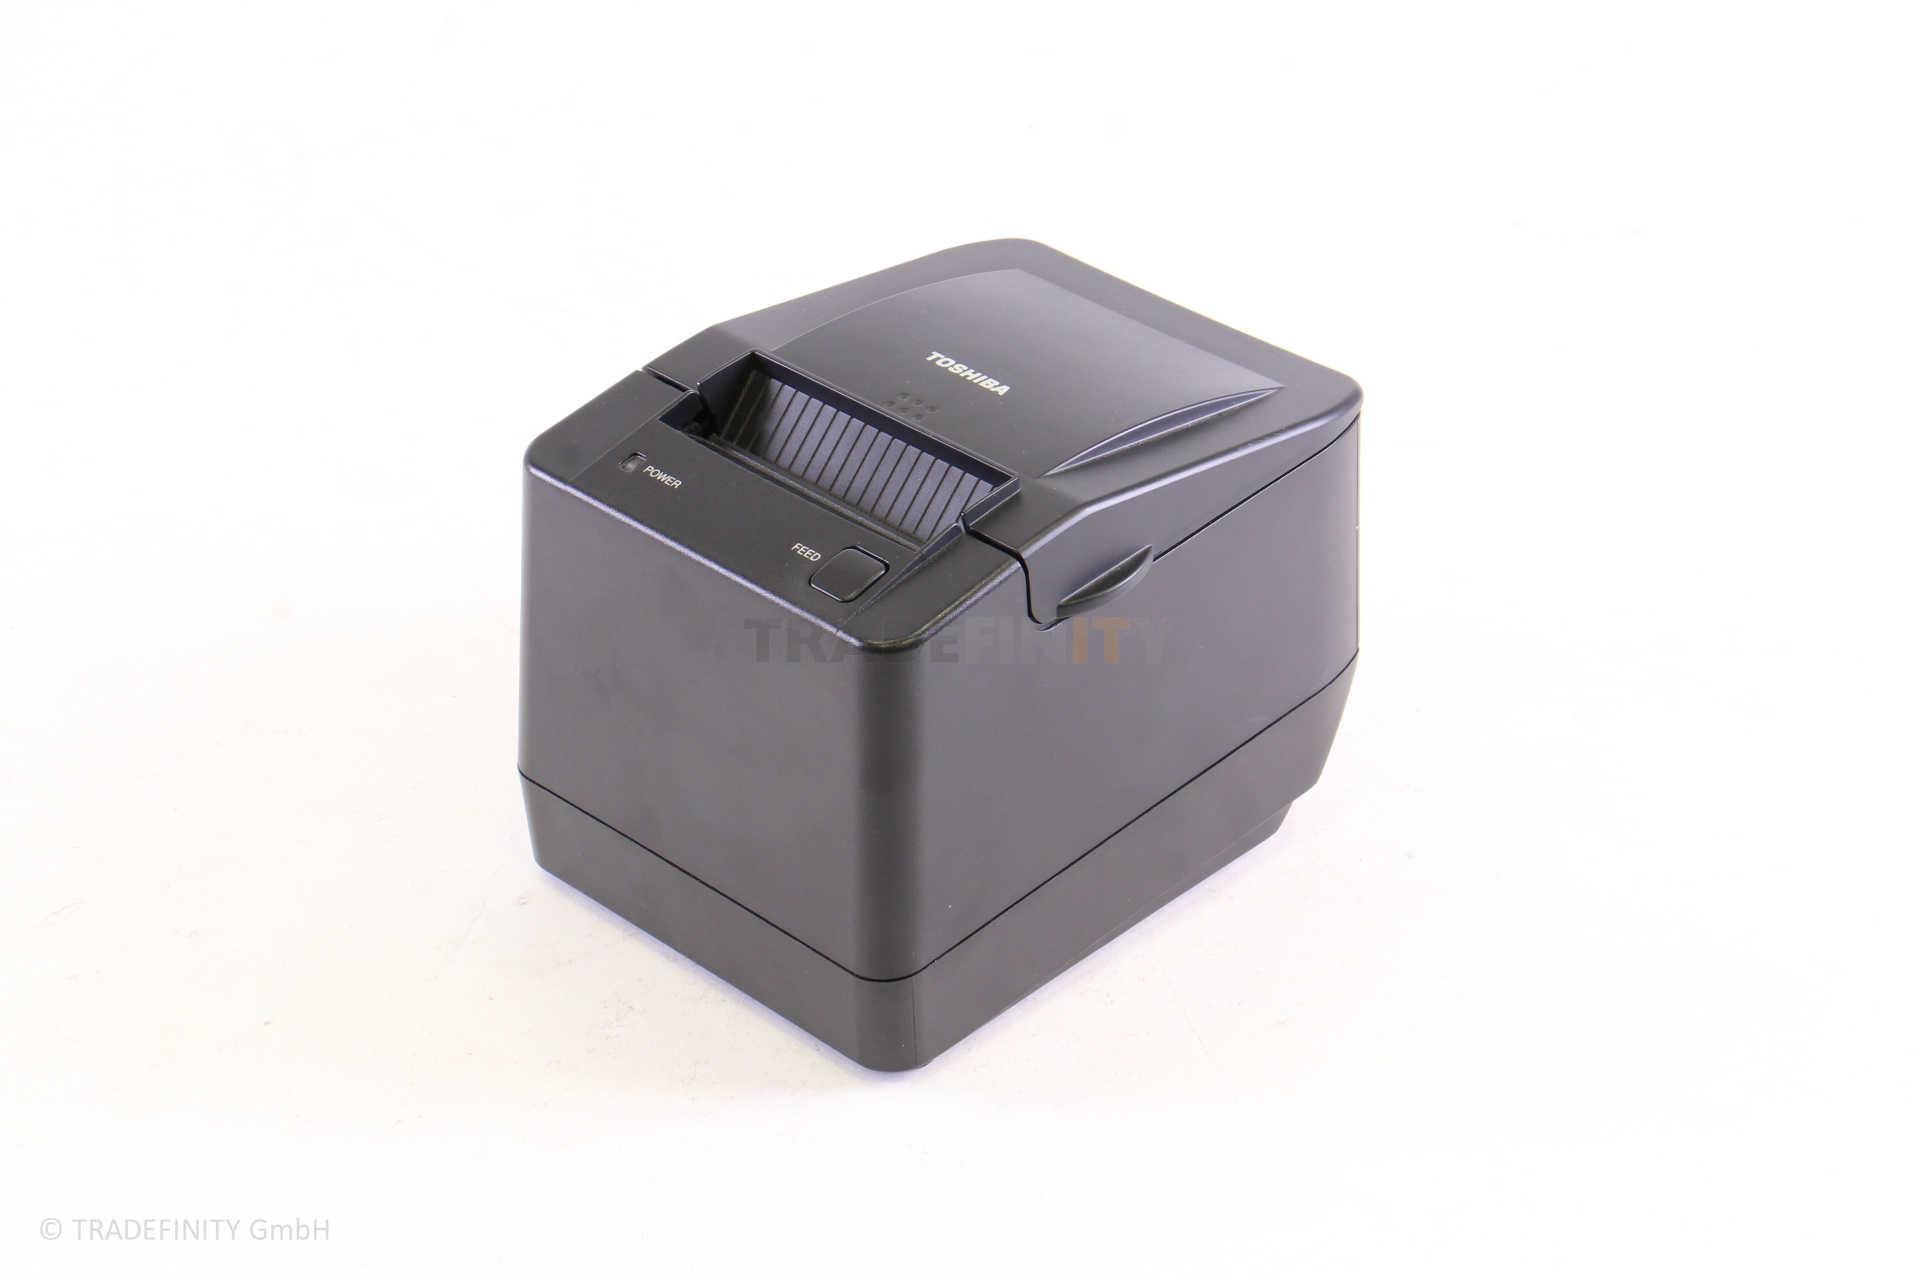 TCxFlight POS Thermal Receipt Printer (Black)